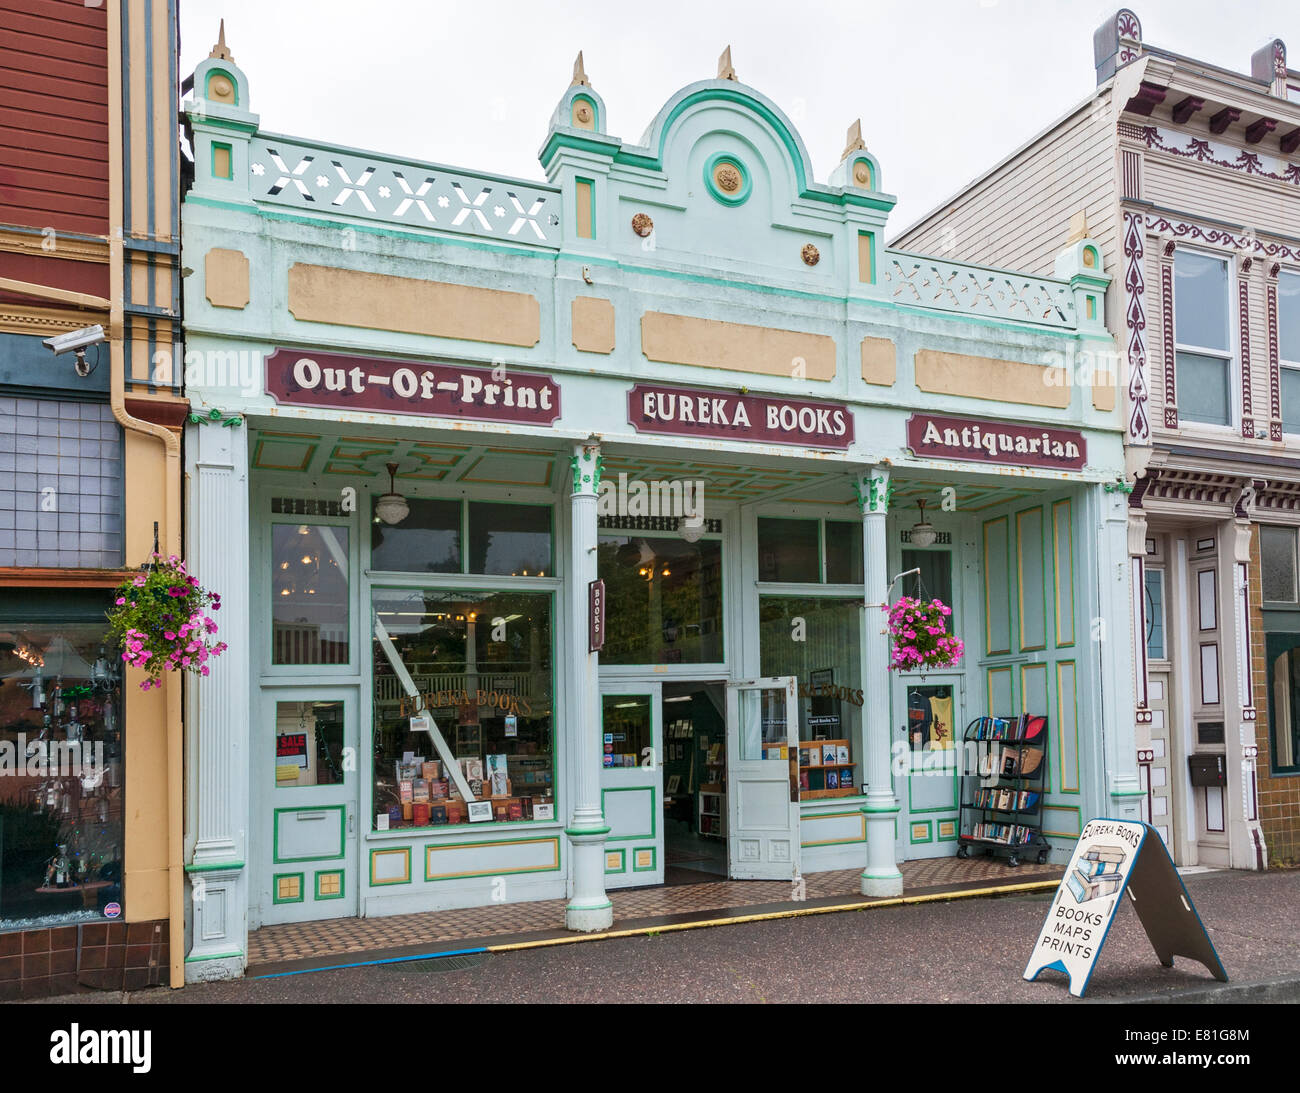 California, Eureka Books, bookstore - Stock Image